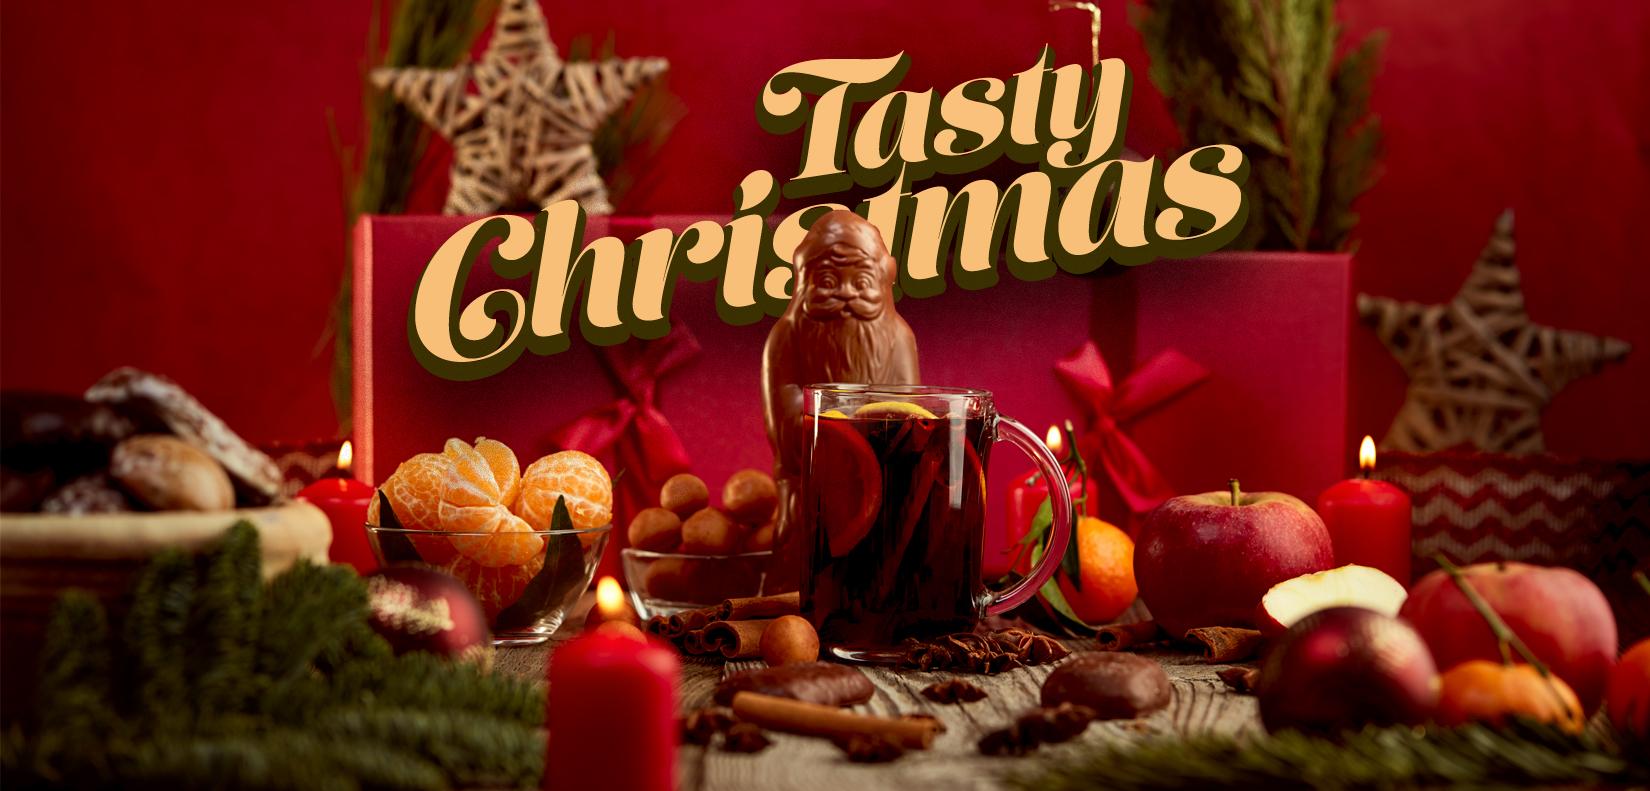 ASM® Tasty Christmas